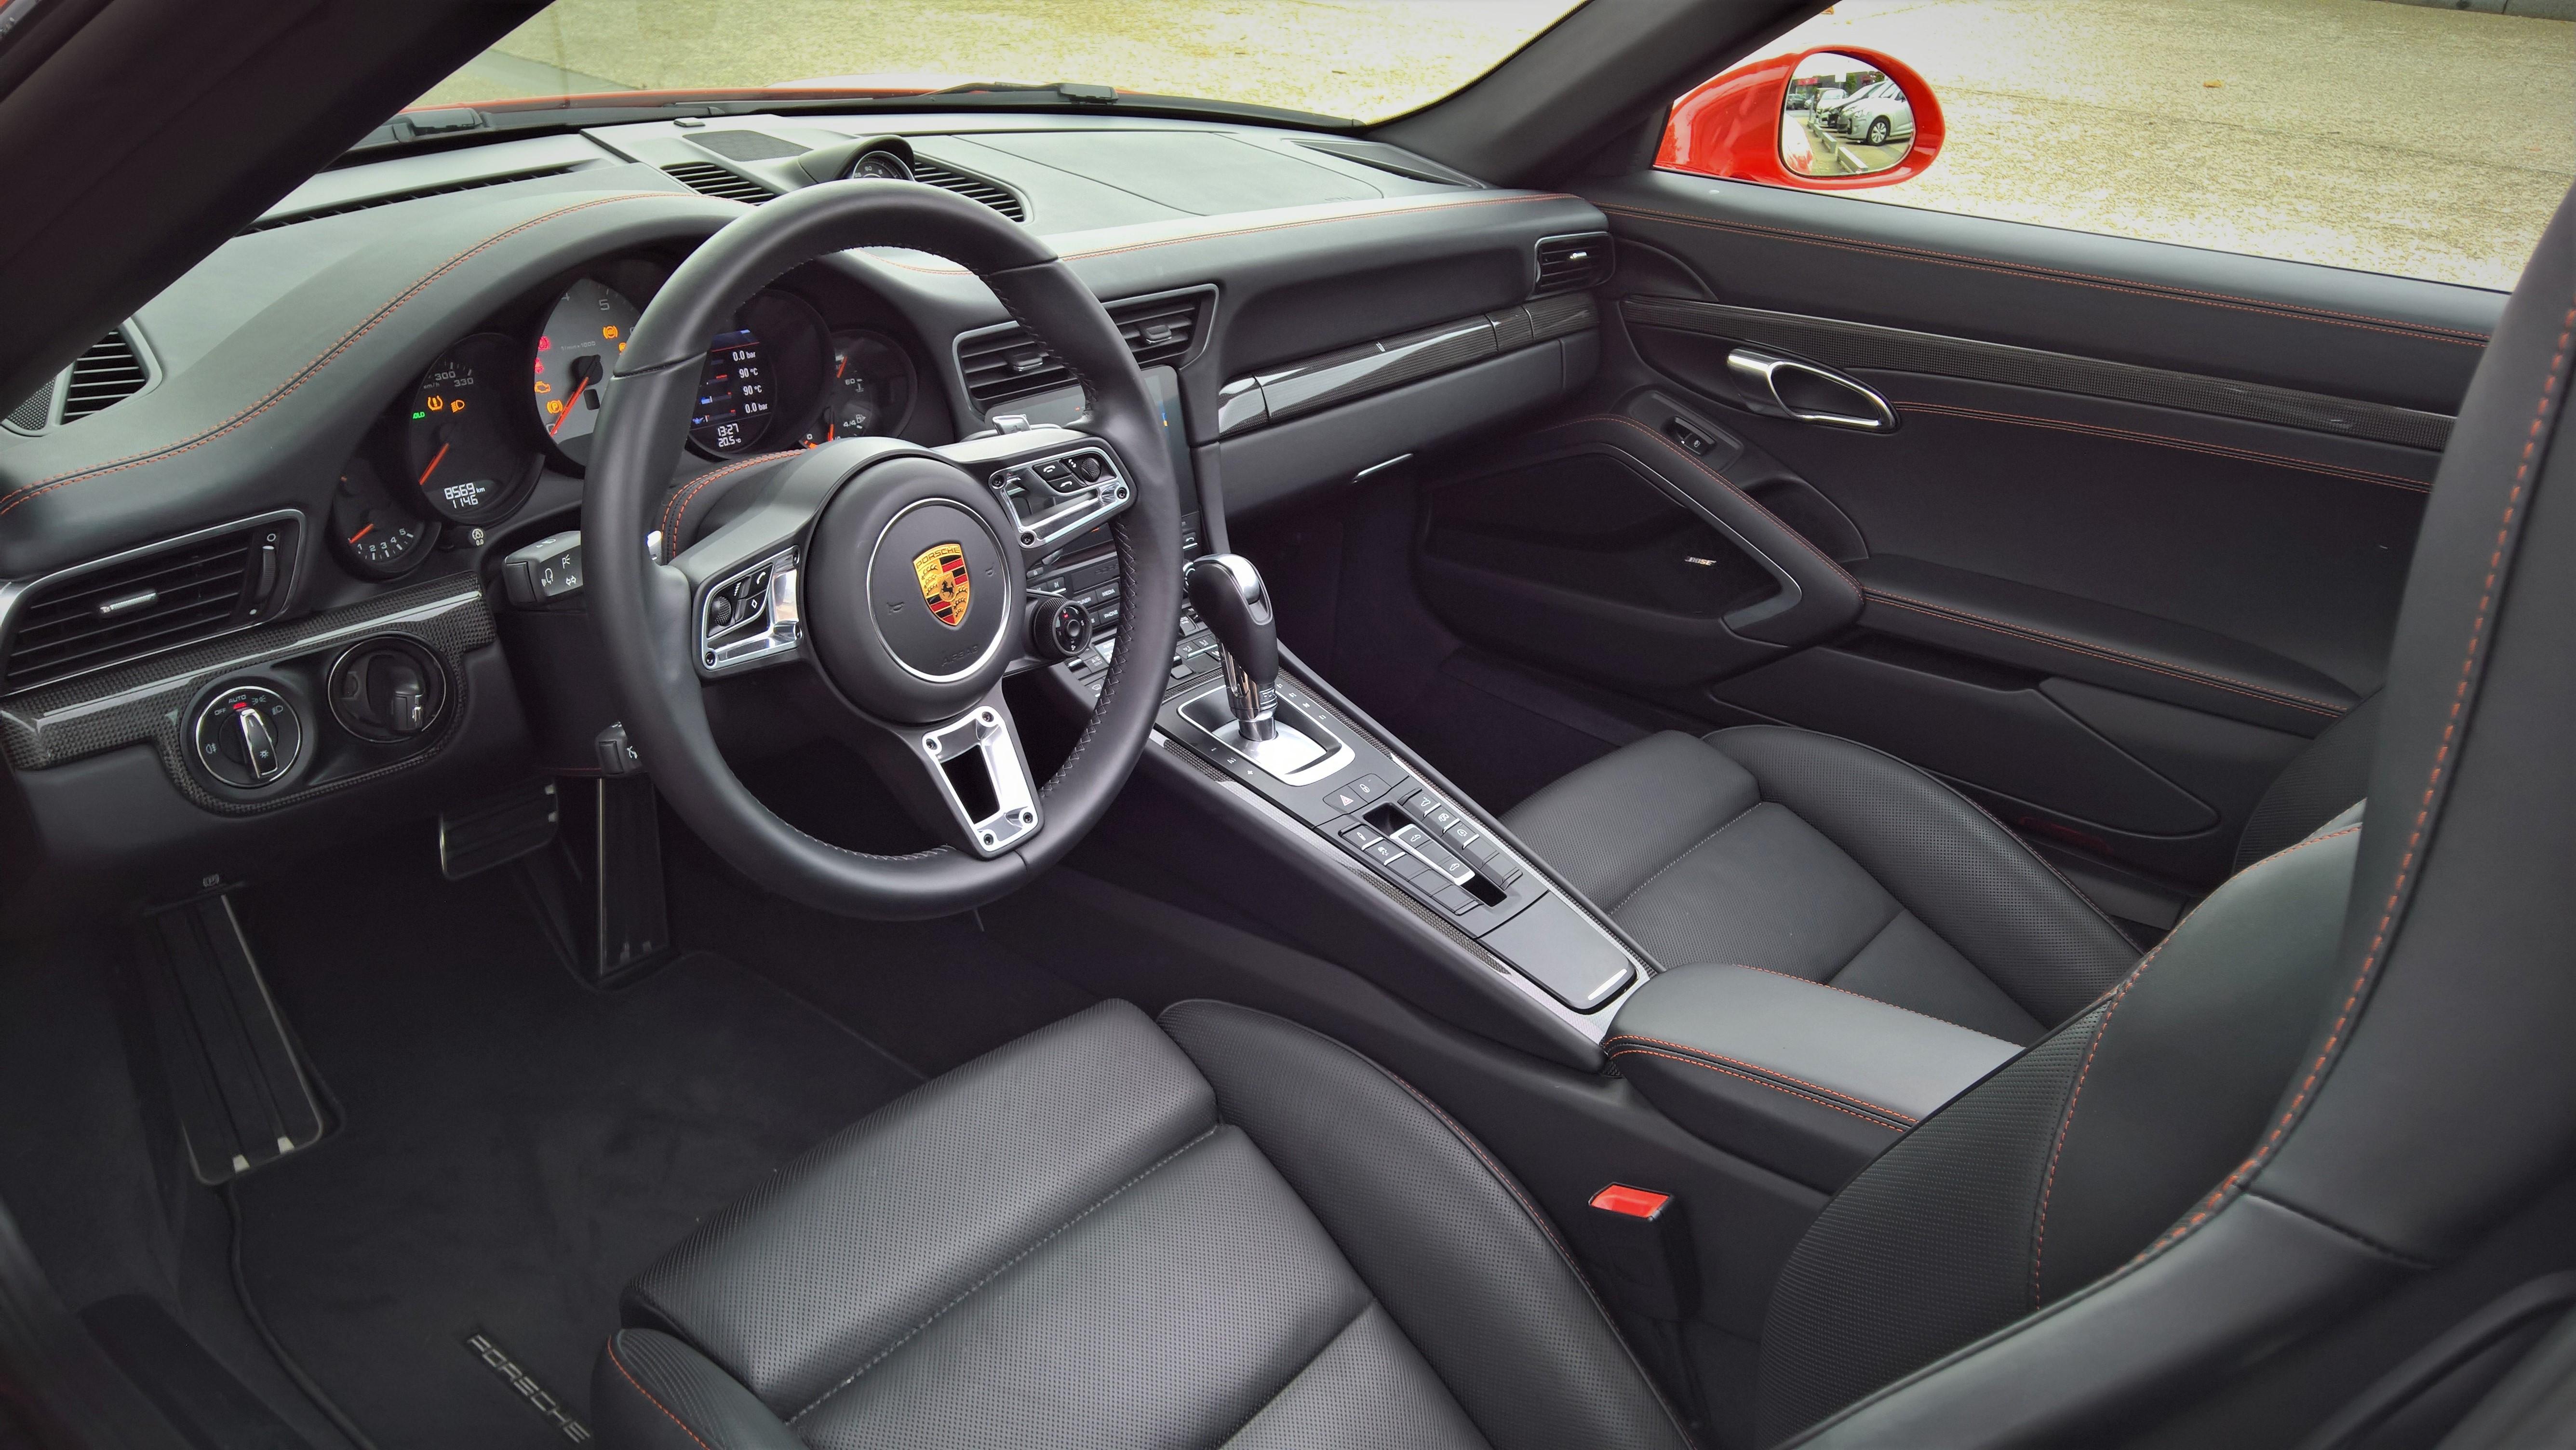 991.2 Targa 4S